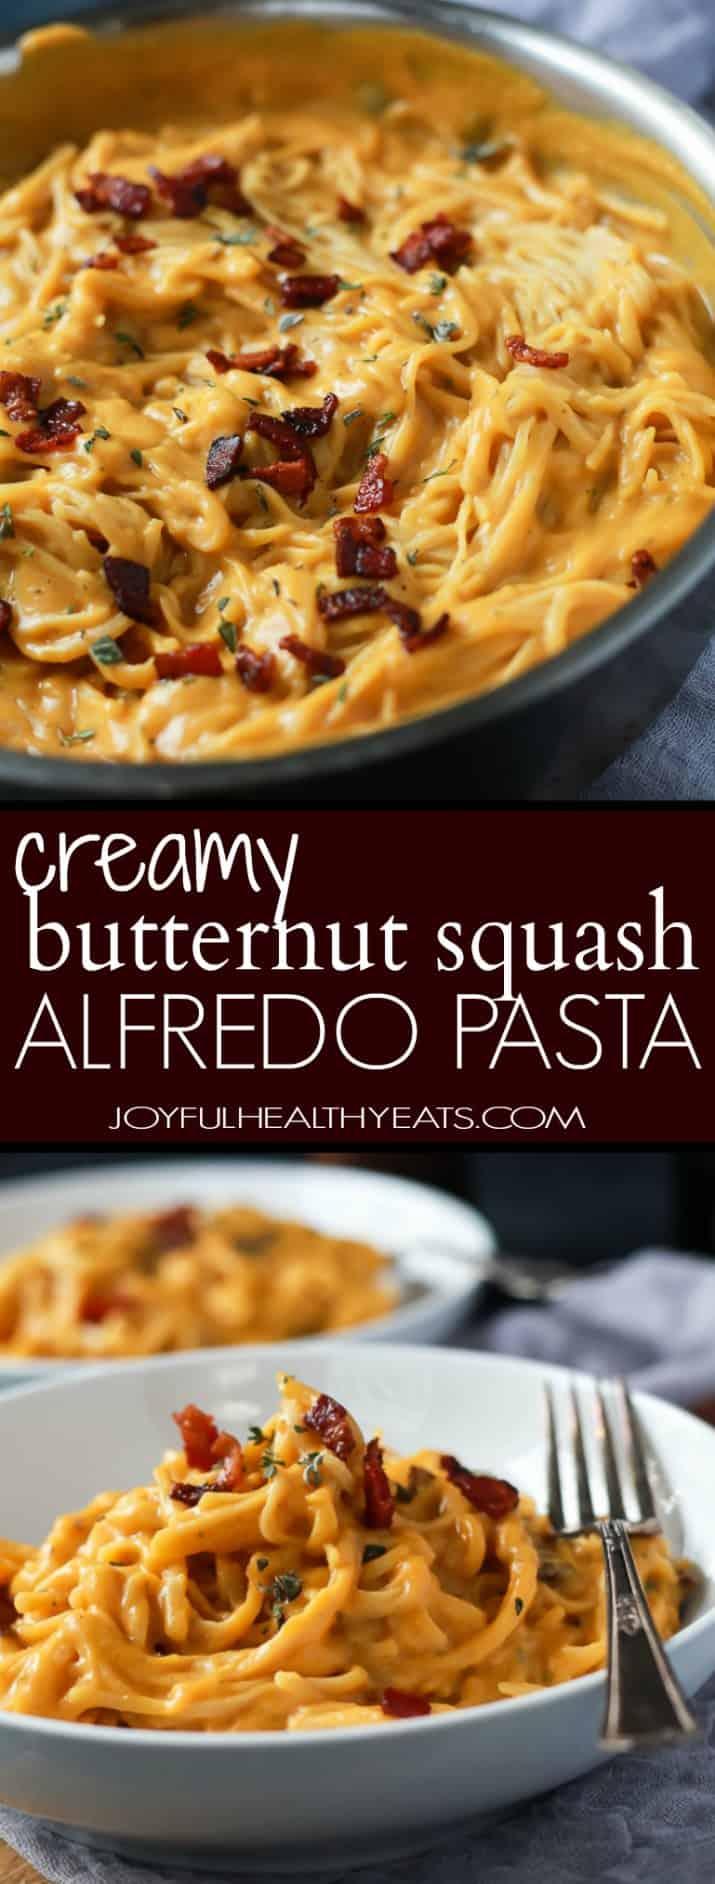 Butternut Squash and Spaghetti Alfredo